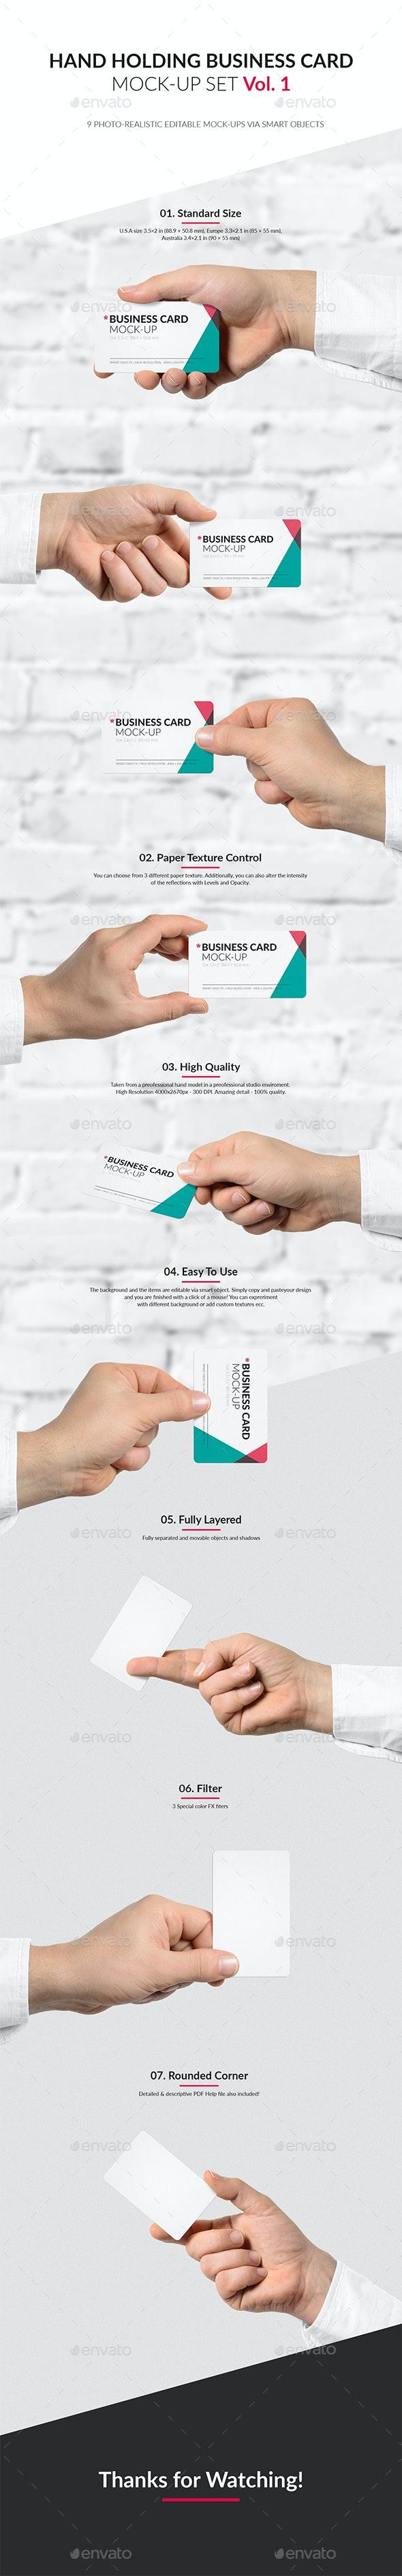 Hand Holding Business Card Mock-Up Set Vol.1 - Business Cards Print